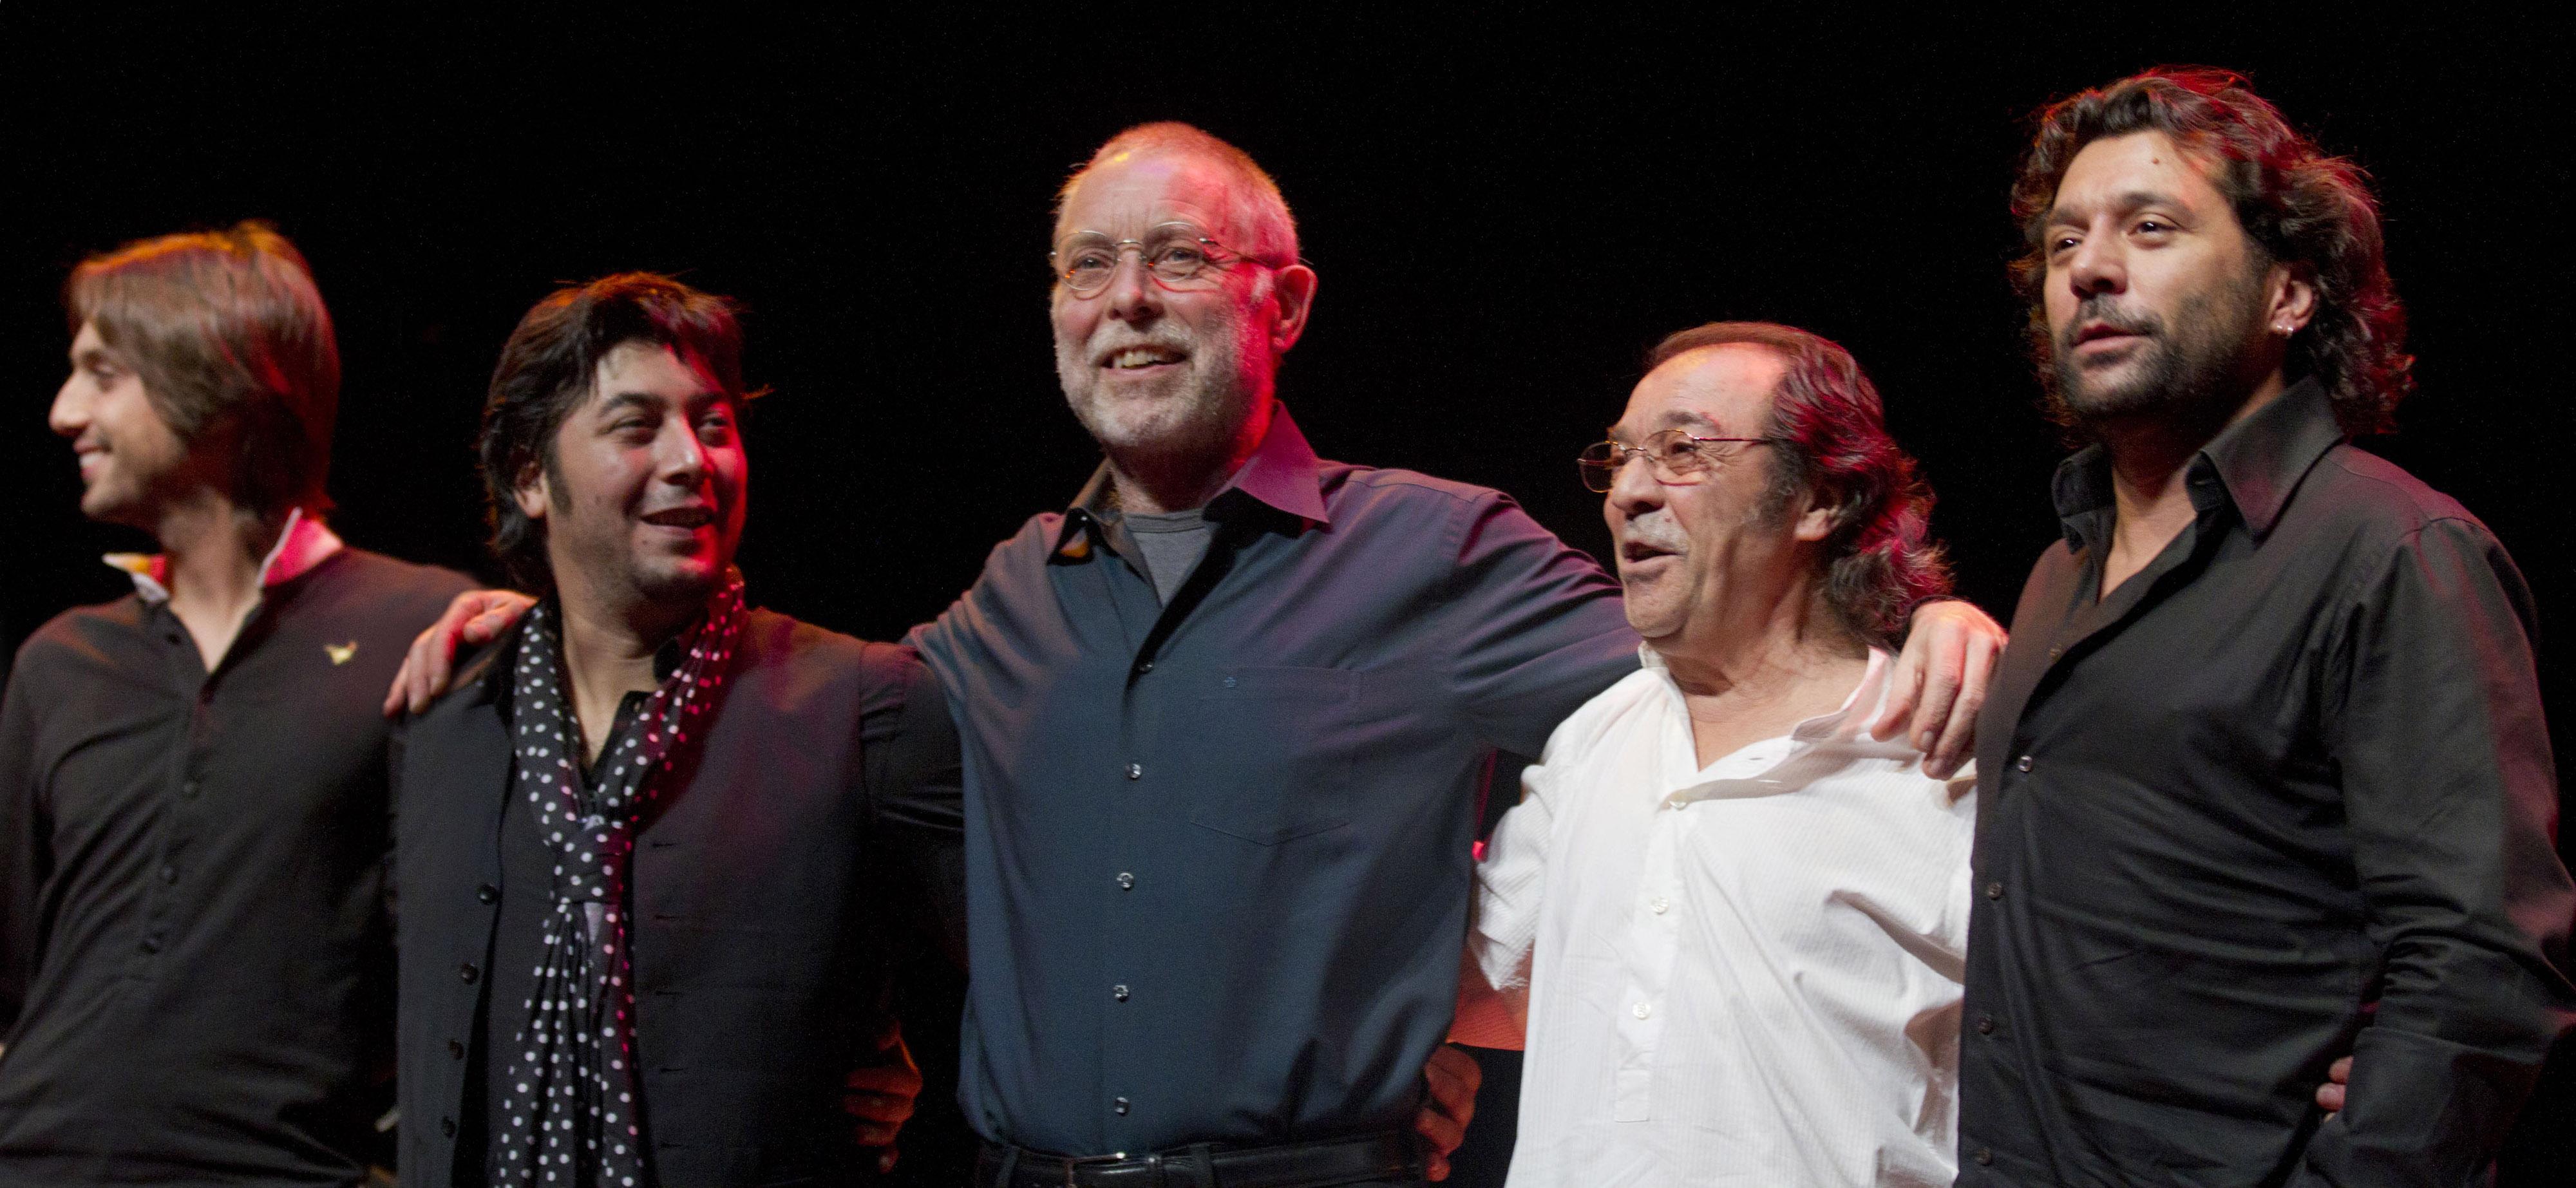 Dave Holland & Pepe Habichuela Quintet